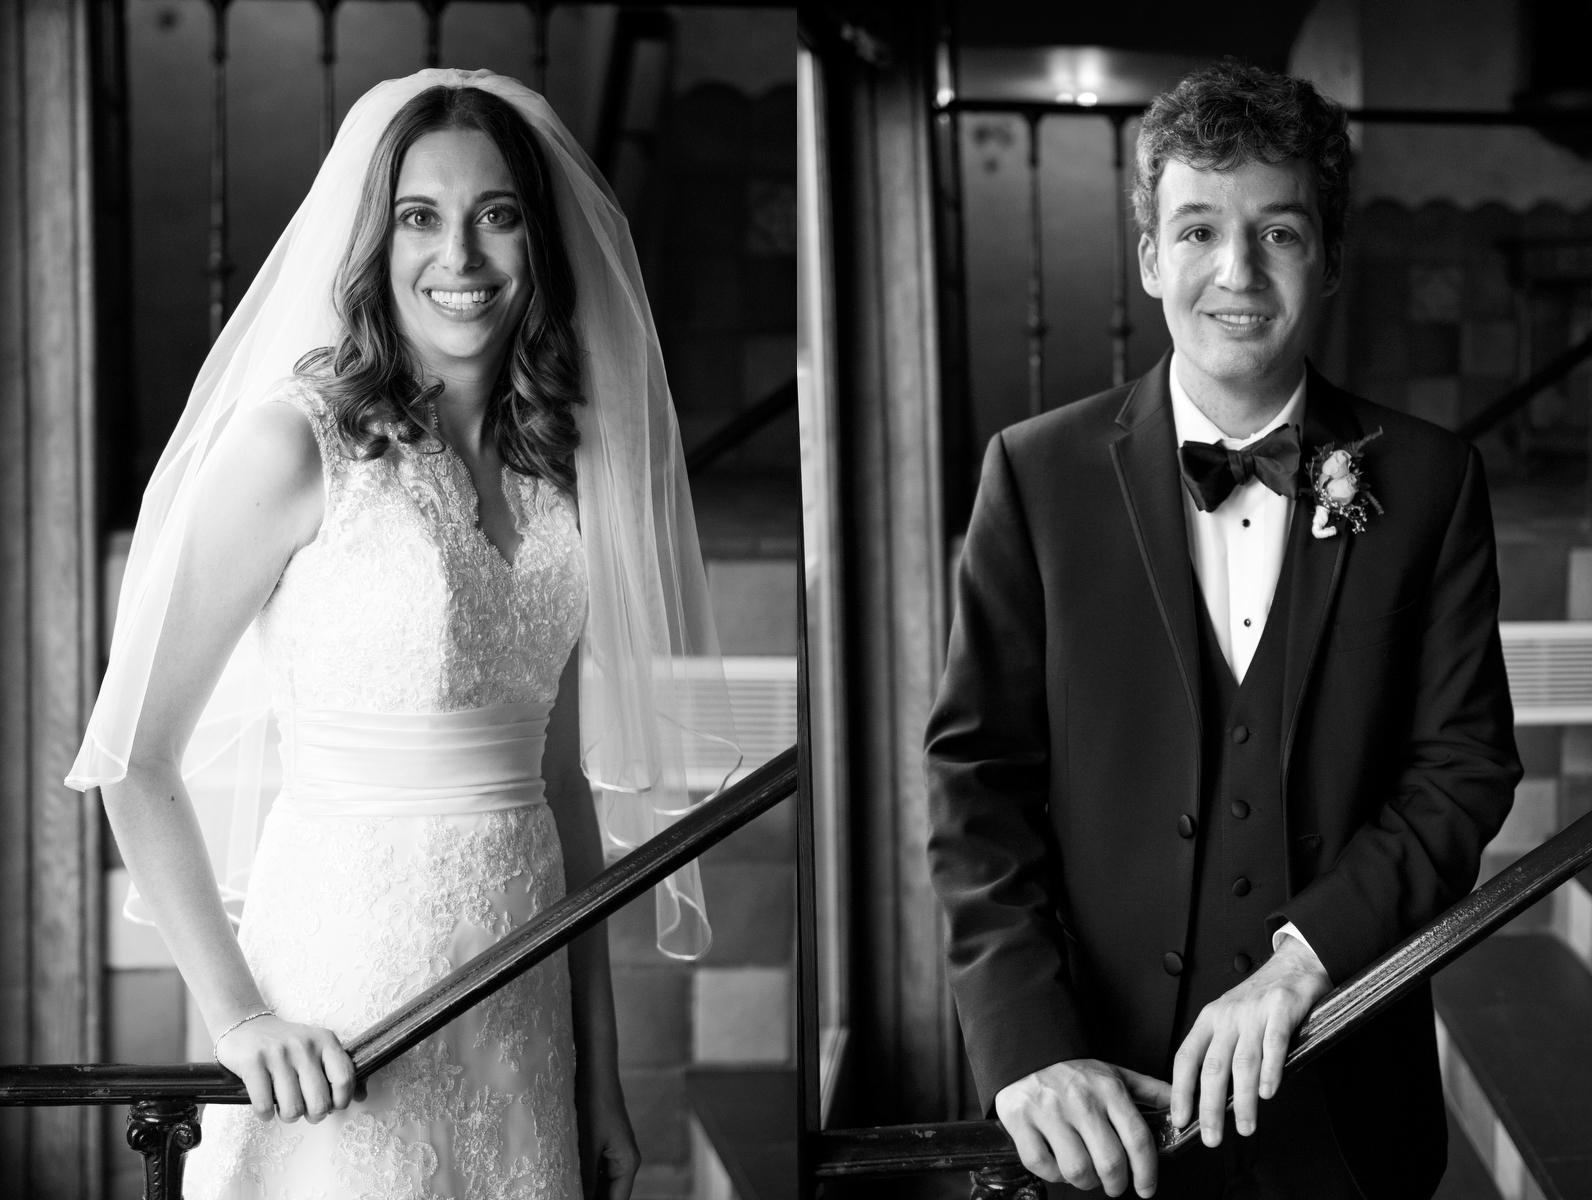 061116 WEDDING Daphna & Keith 173.JPG